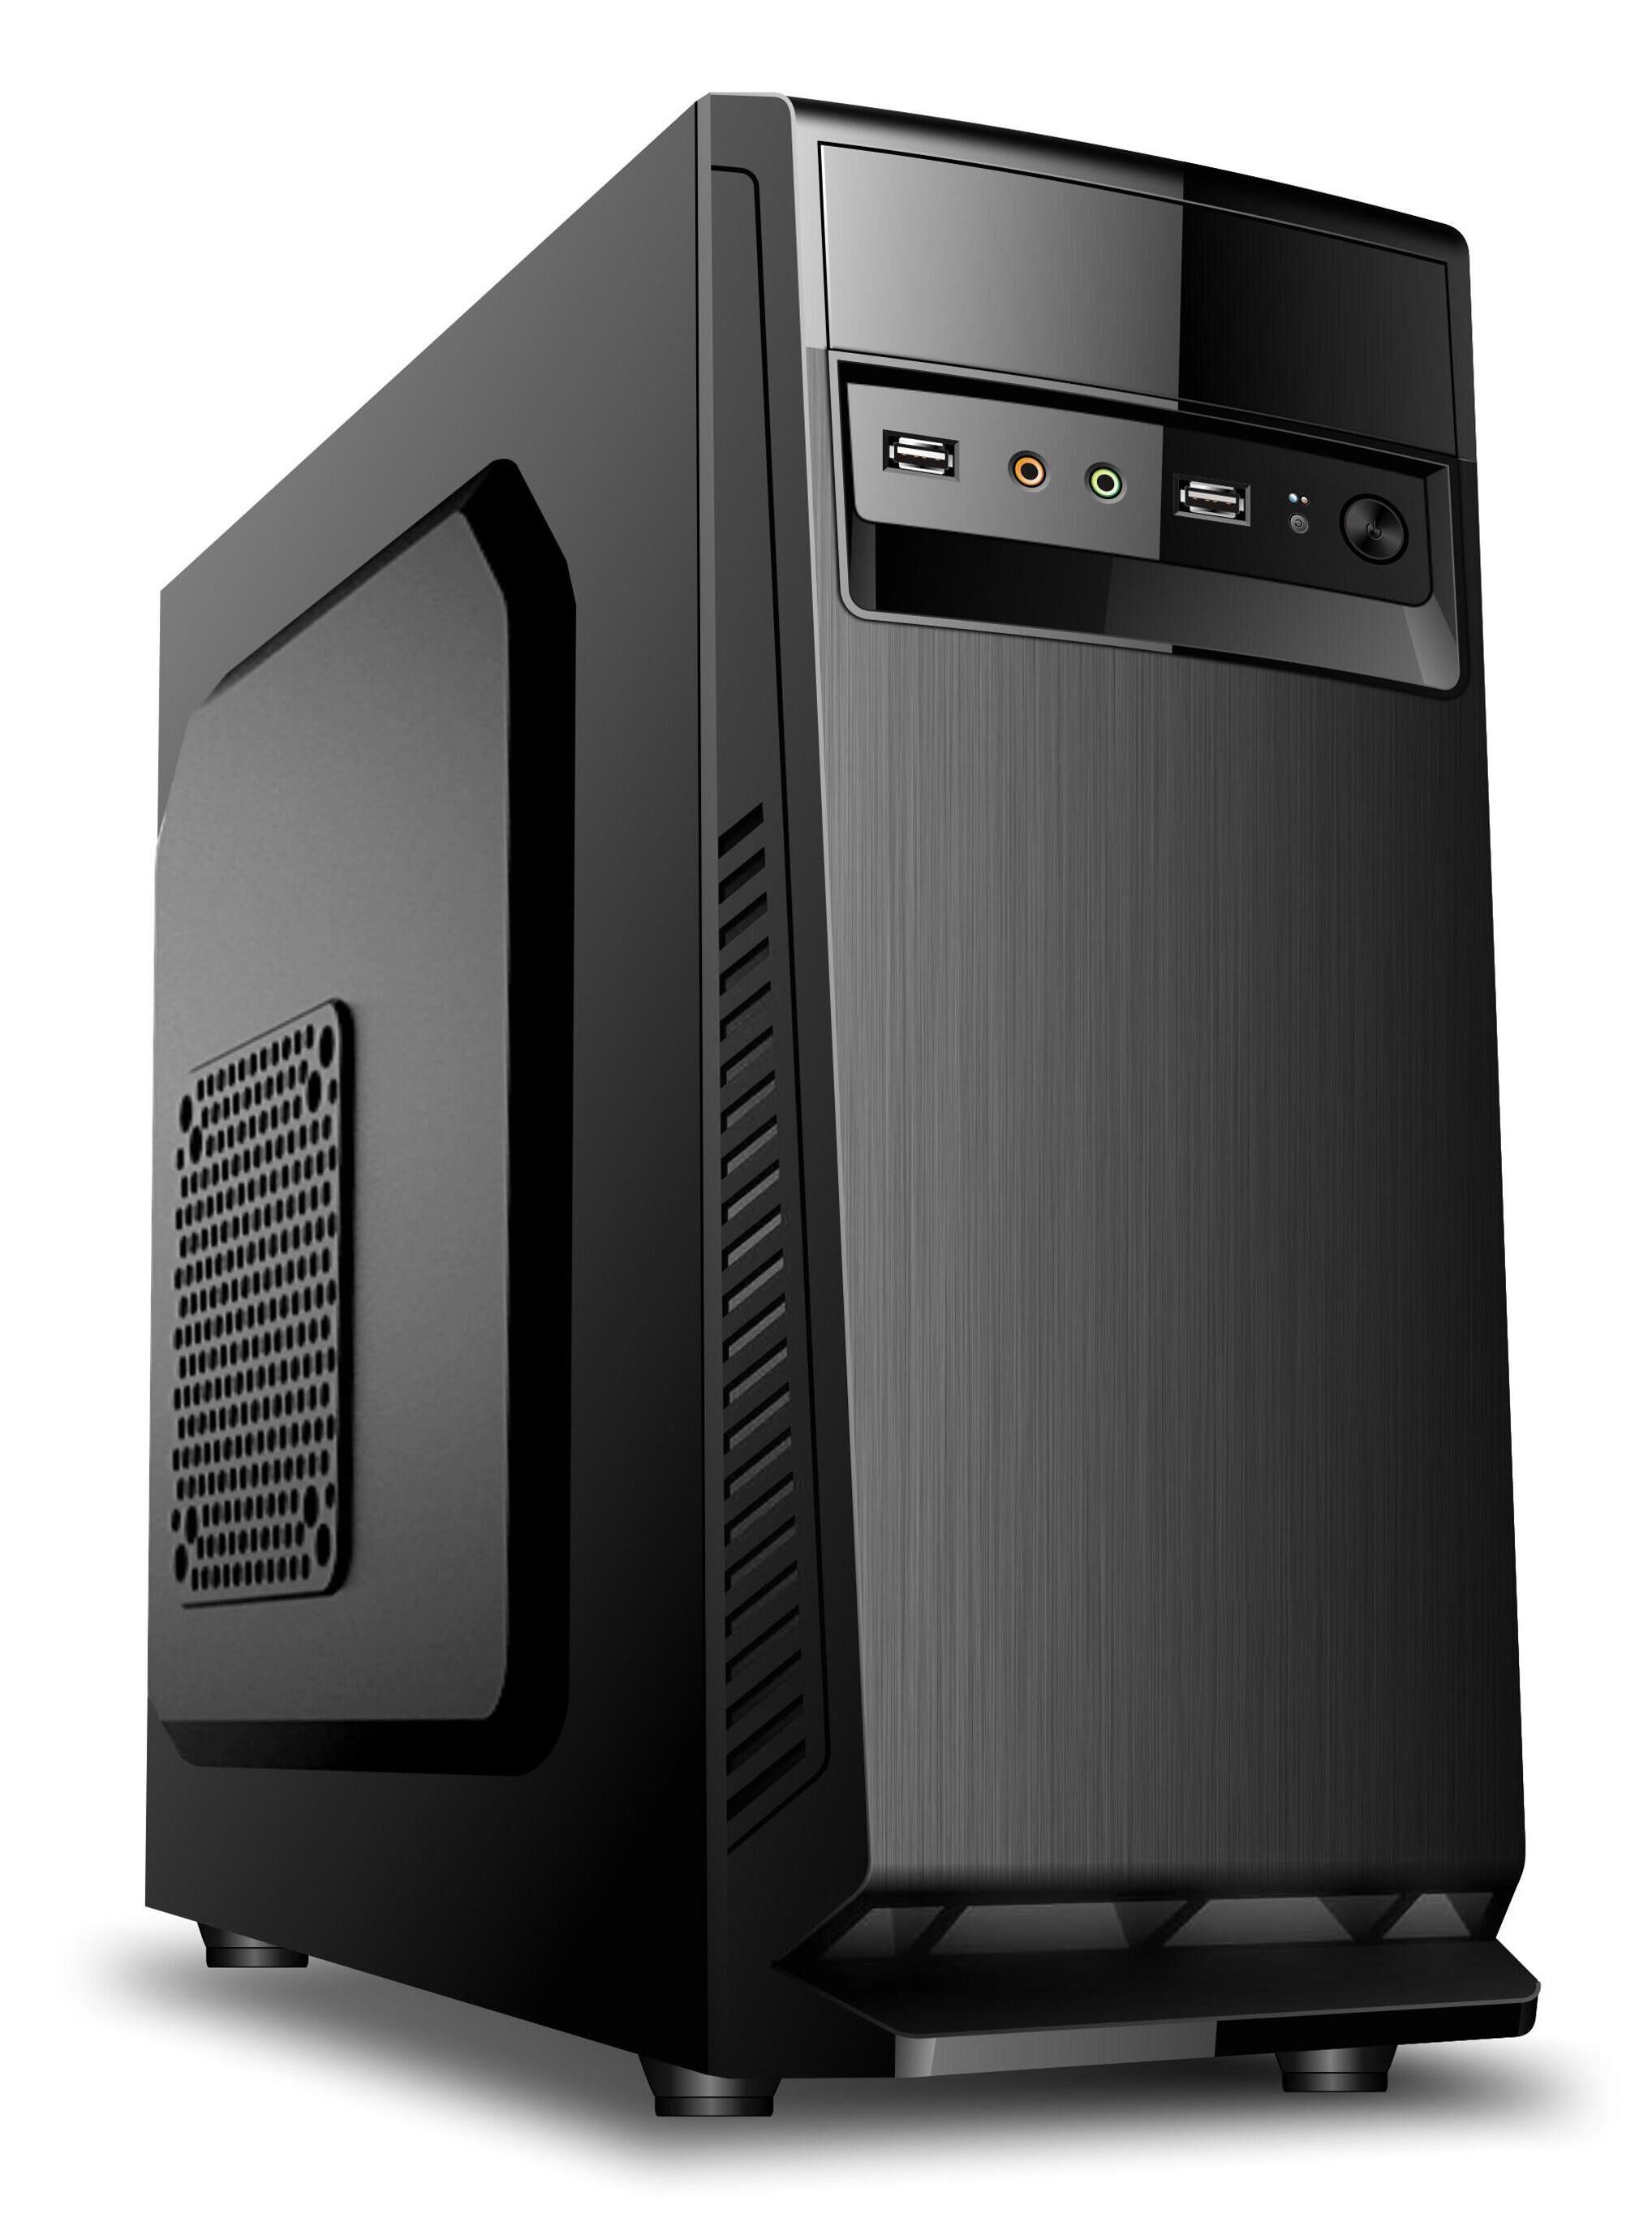 COMTRADE Core i3 6320 4GB 500